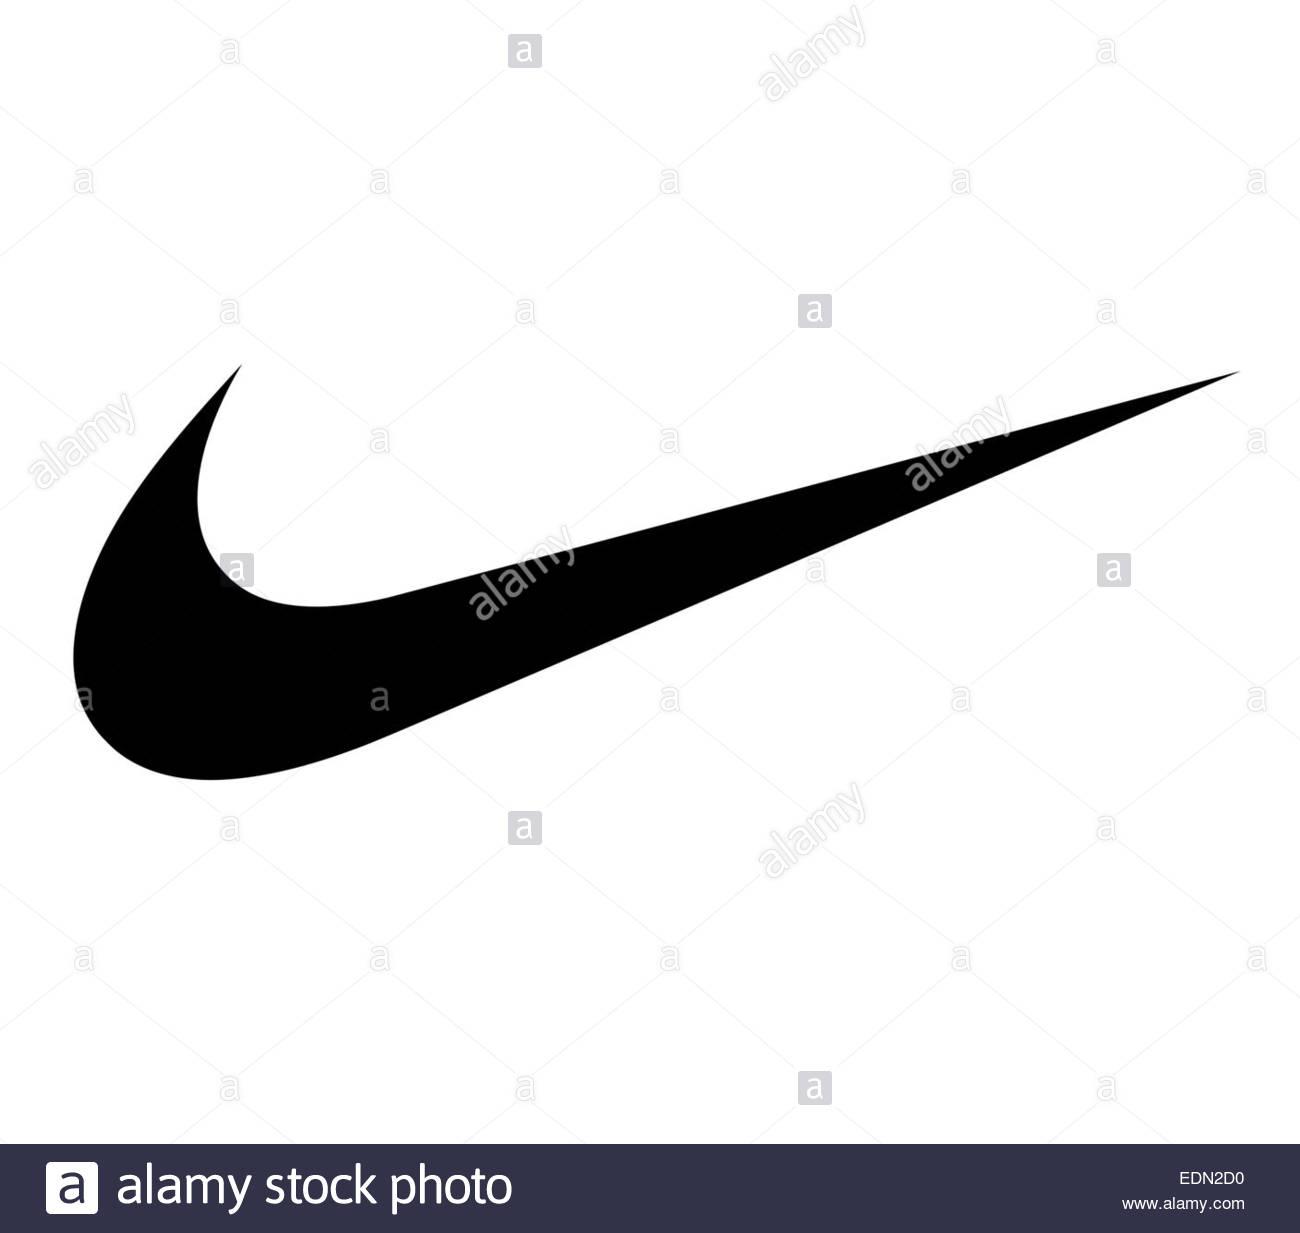 Nike Logo Stock Photos & Nike Logo Stock Images